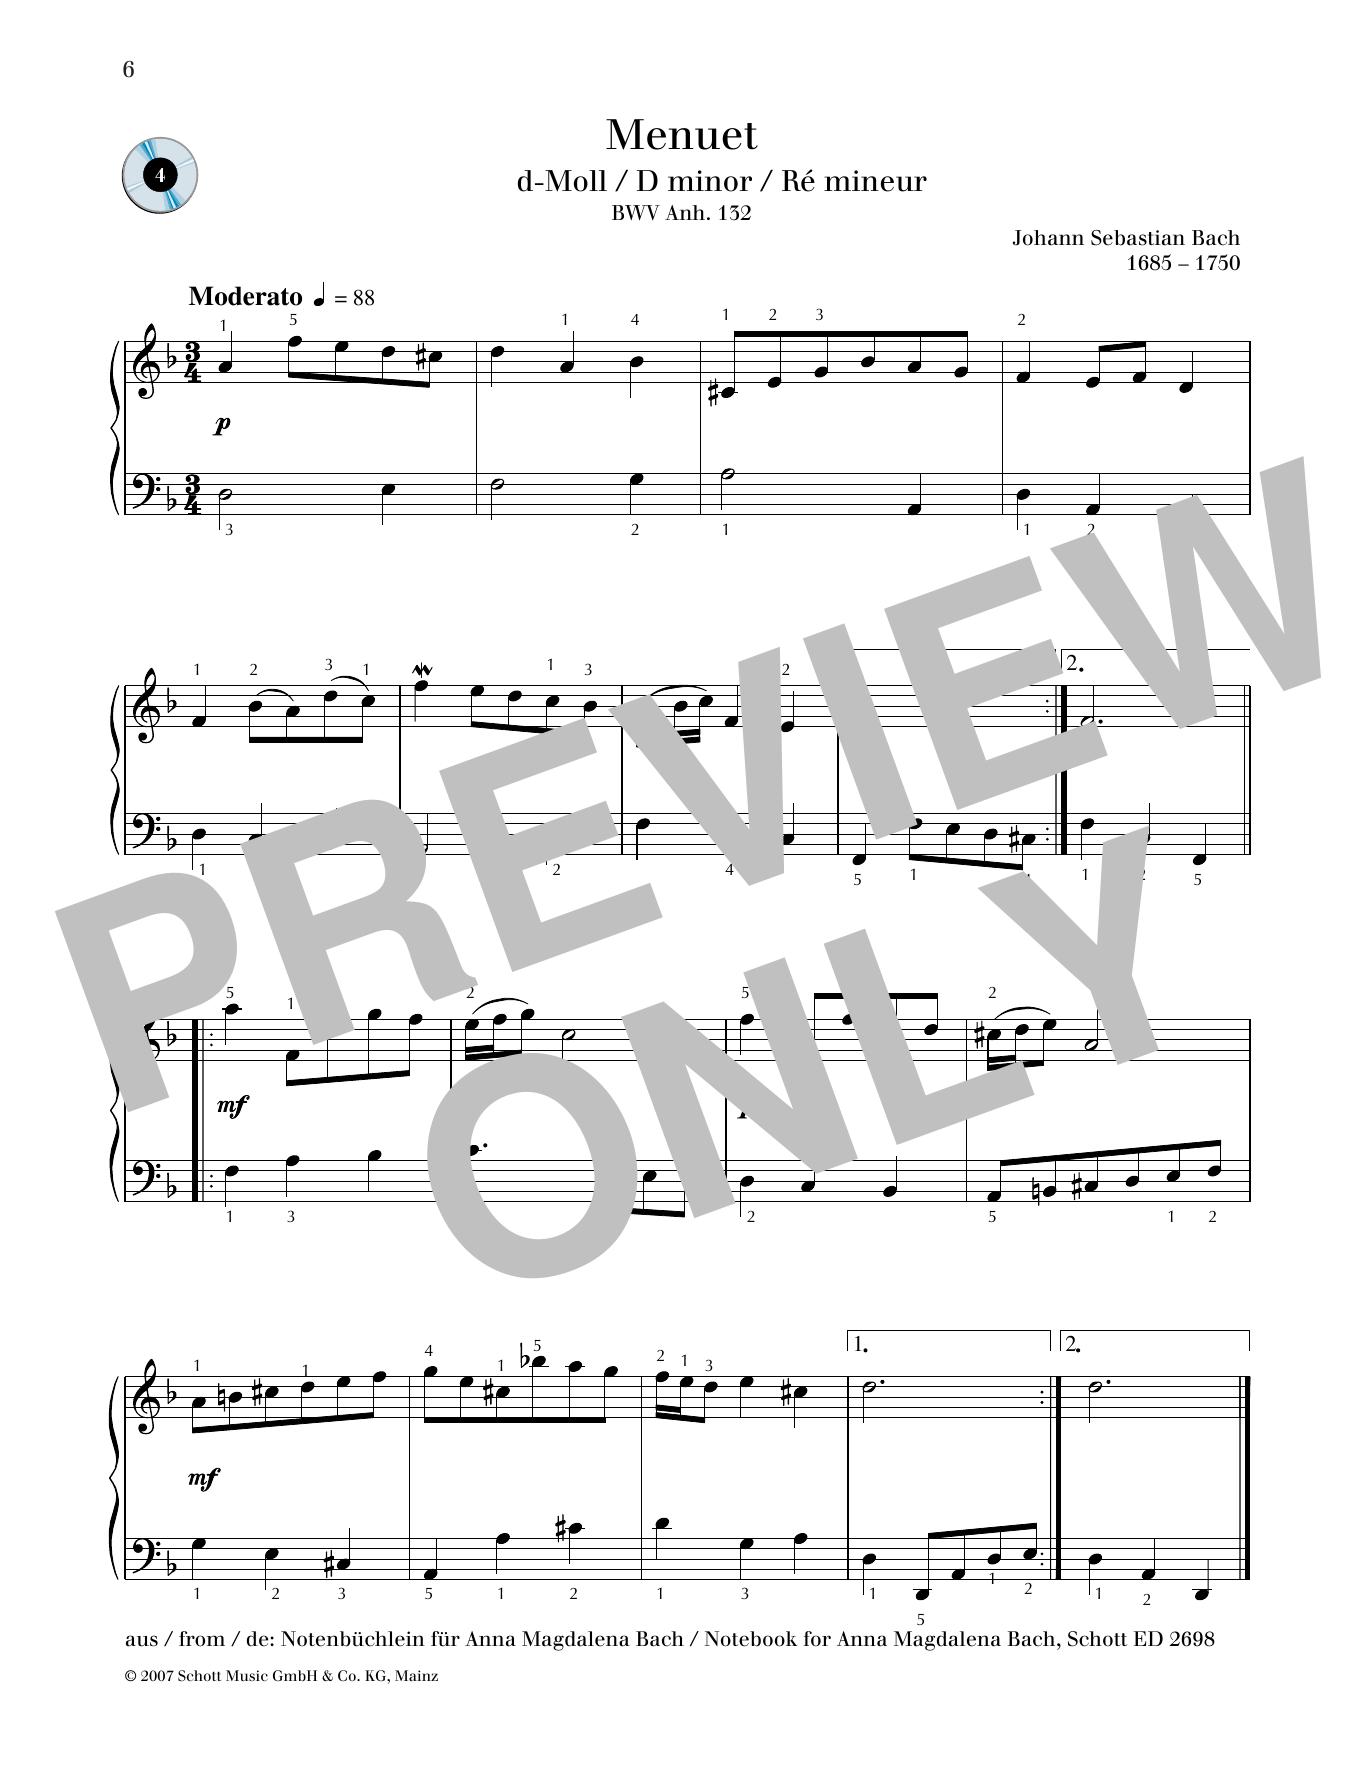 Minuet D minor